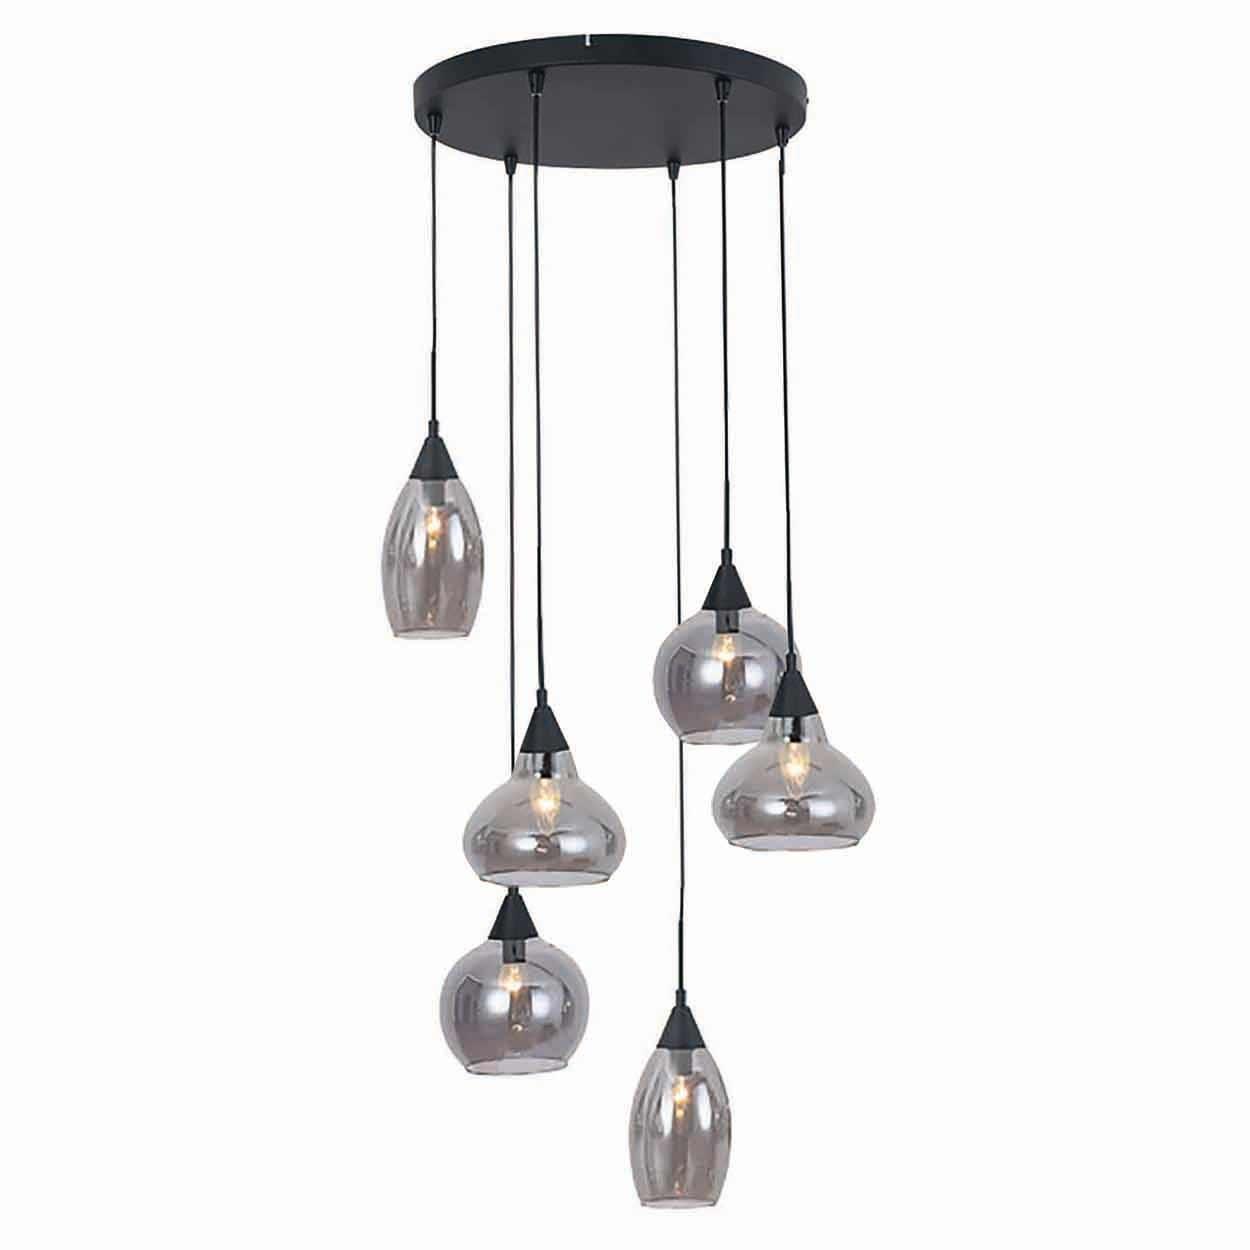 Freelight Hanglamp Macchia 6 lichts Ø 40 cm rook glas zwart